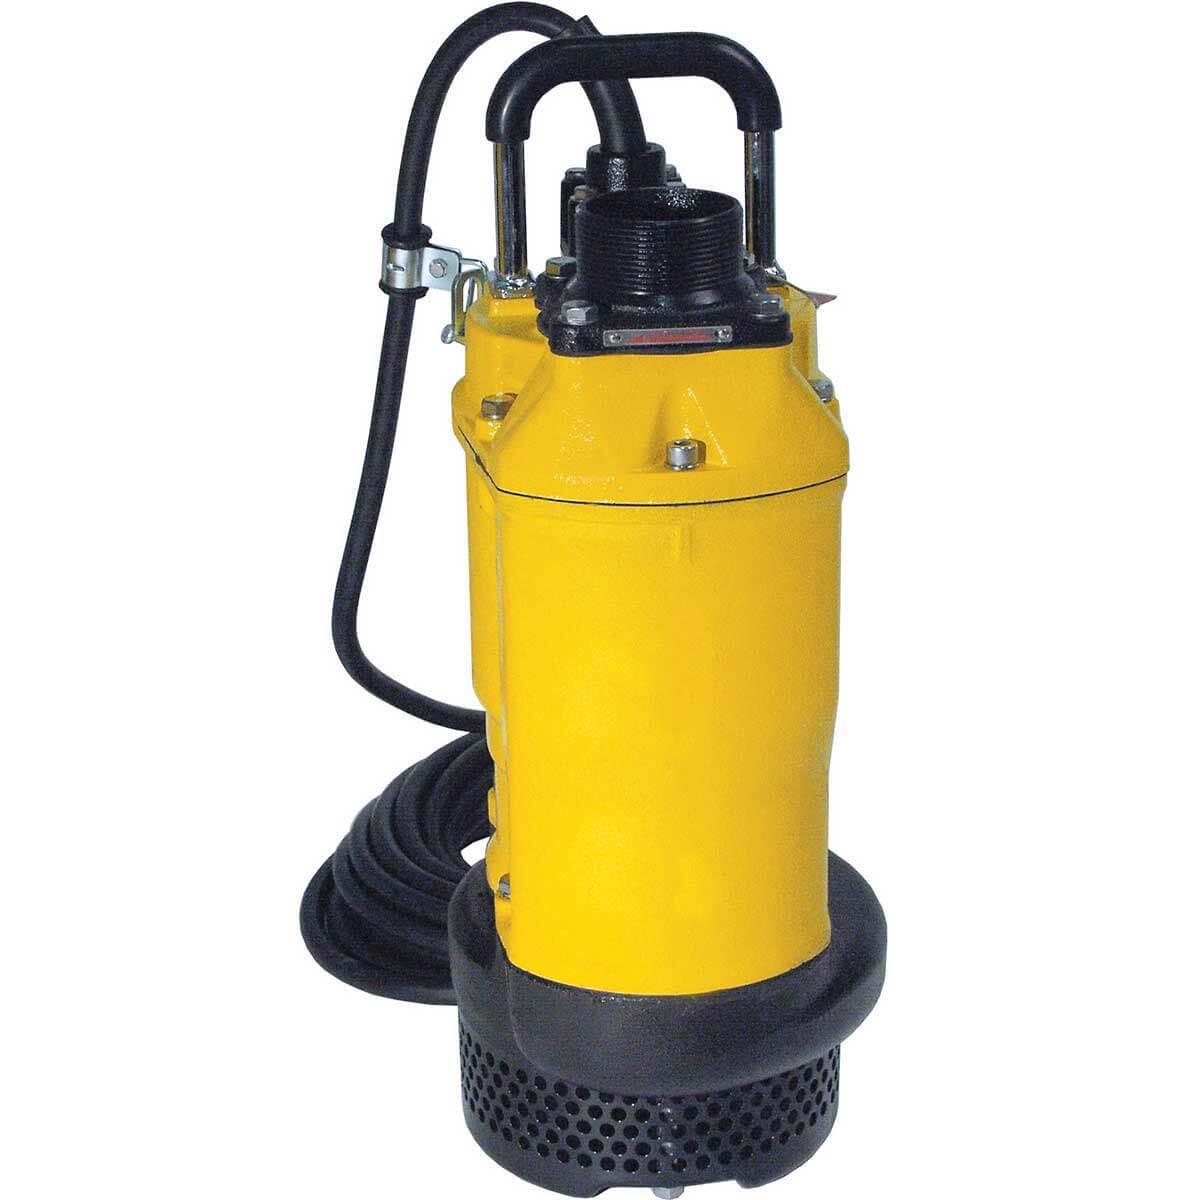 PS35503 Wacker Neuson 3 inch Submersible Pump 220V